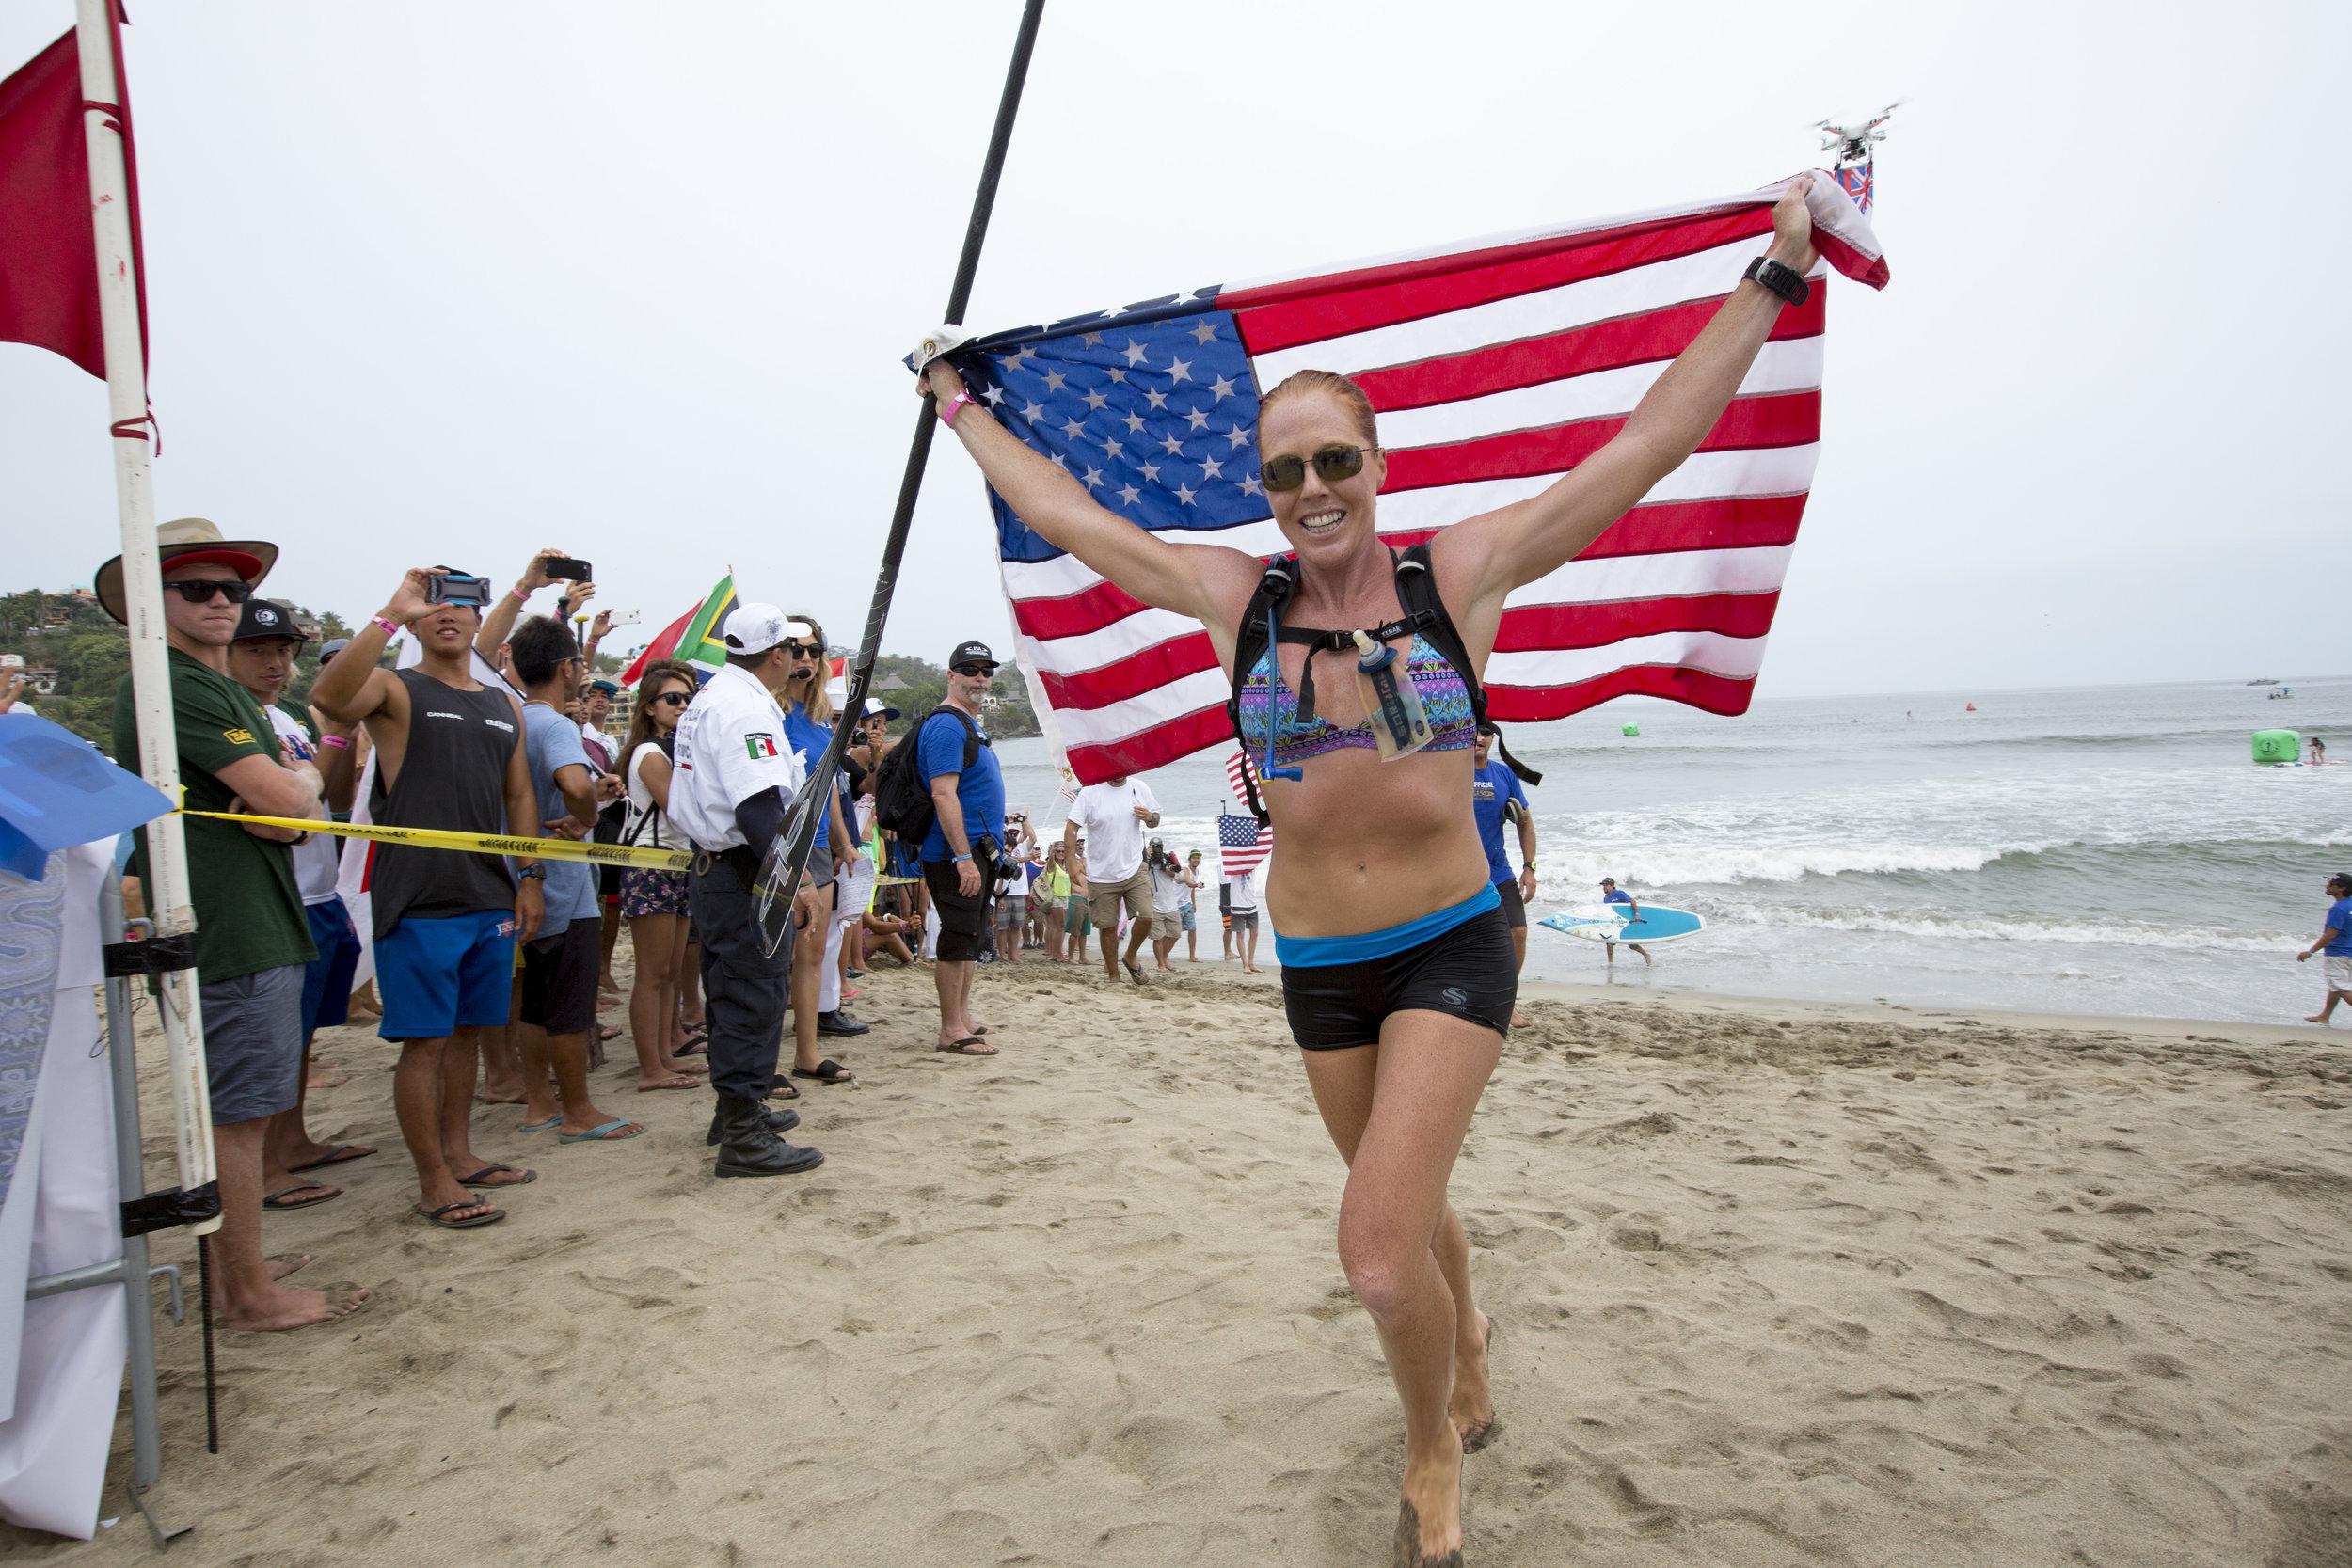 Candice Appleby - USASUP Distance Race, Technical Race, Sprint Race